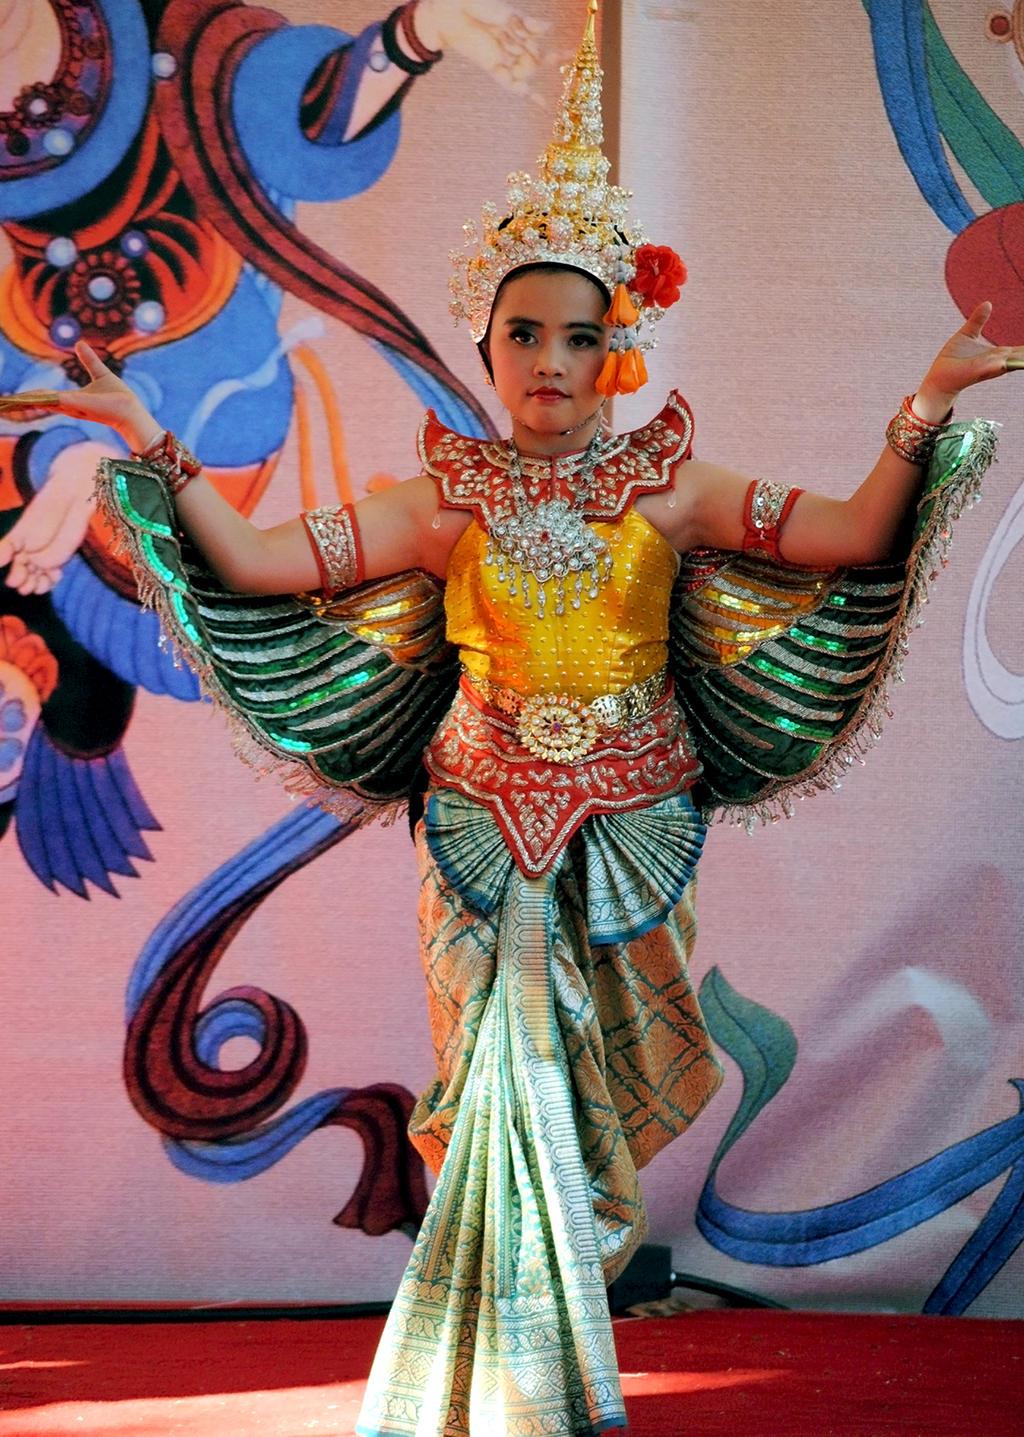 Lormet_Cultural-Dancer-0361 by Lormet-Images